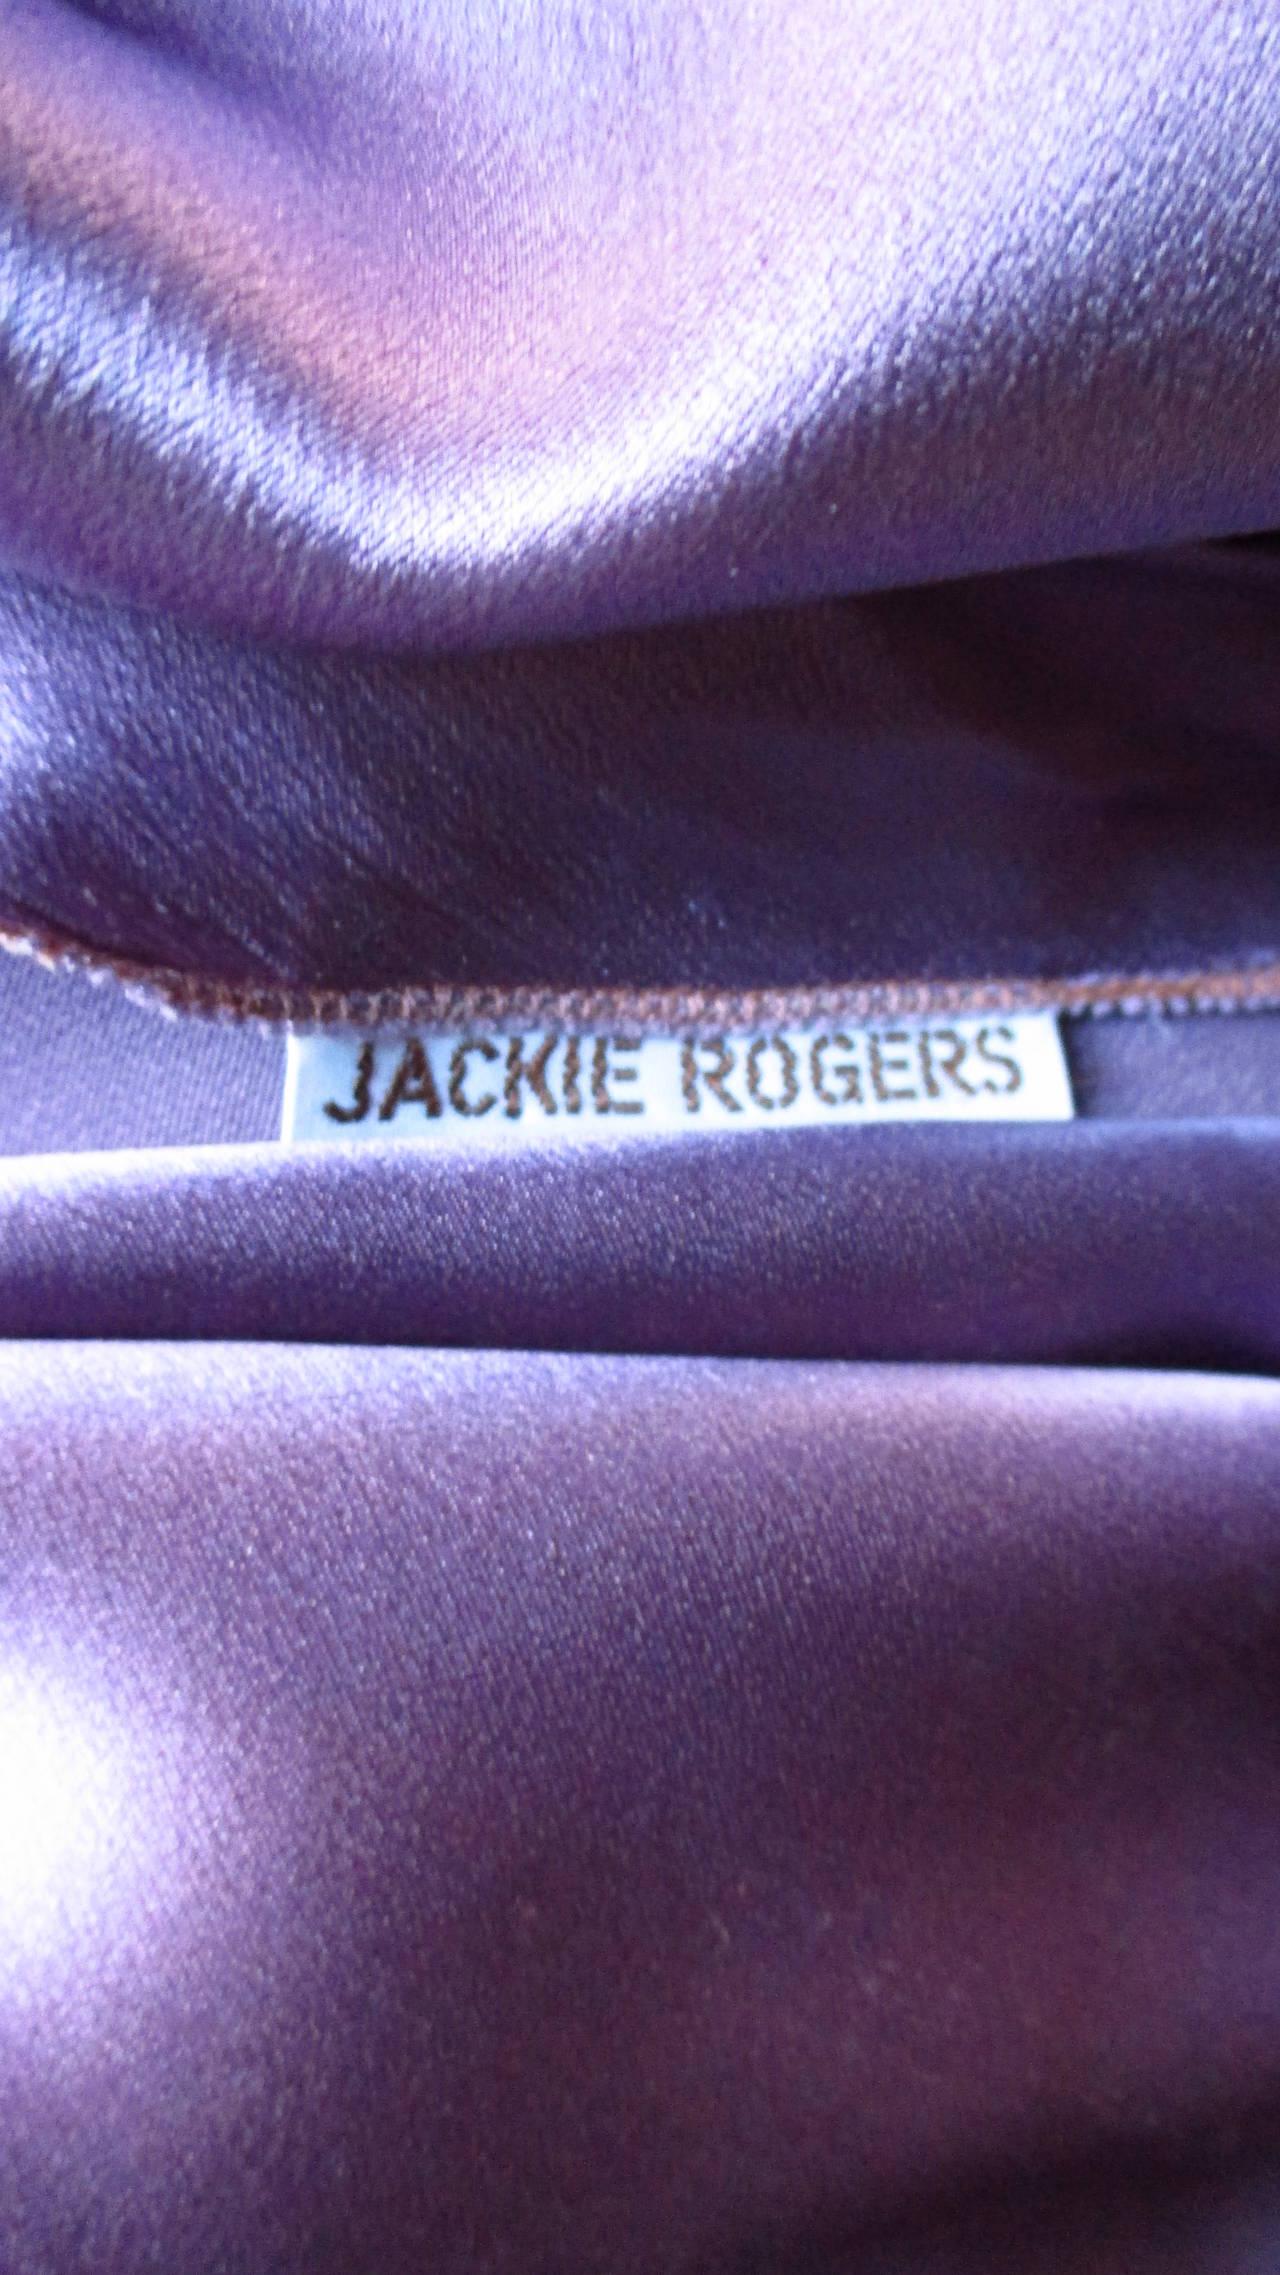 Jackie Rogers Silk Plunge Dress & Wrap 9